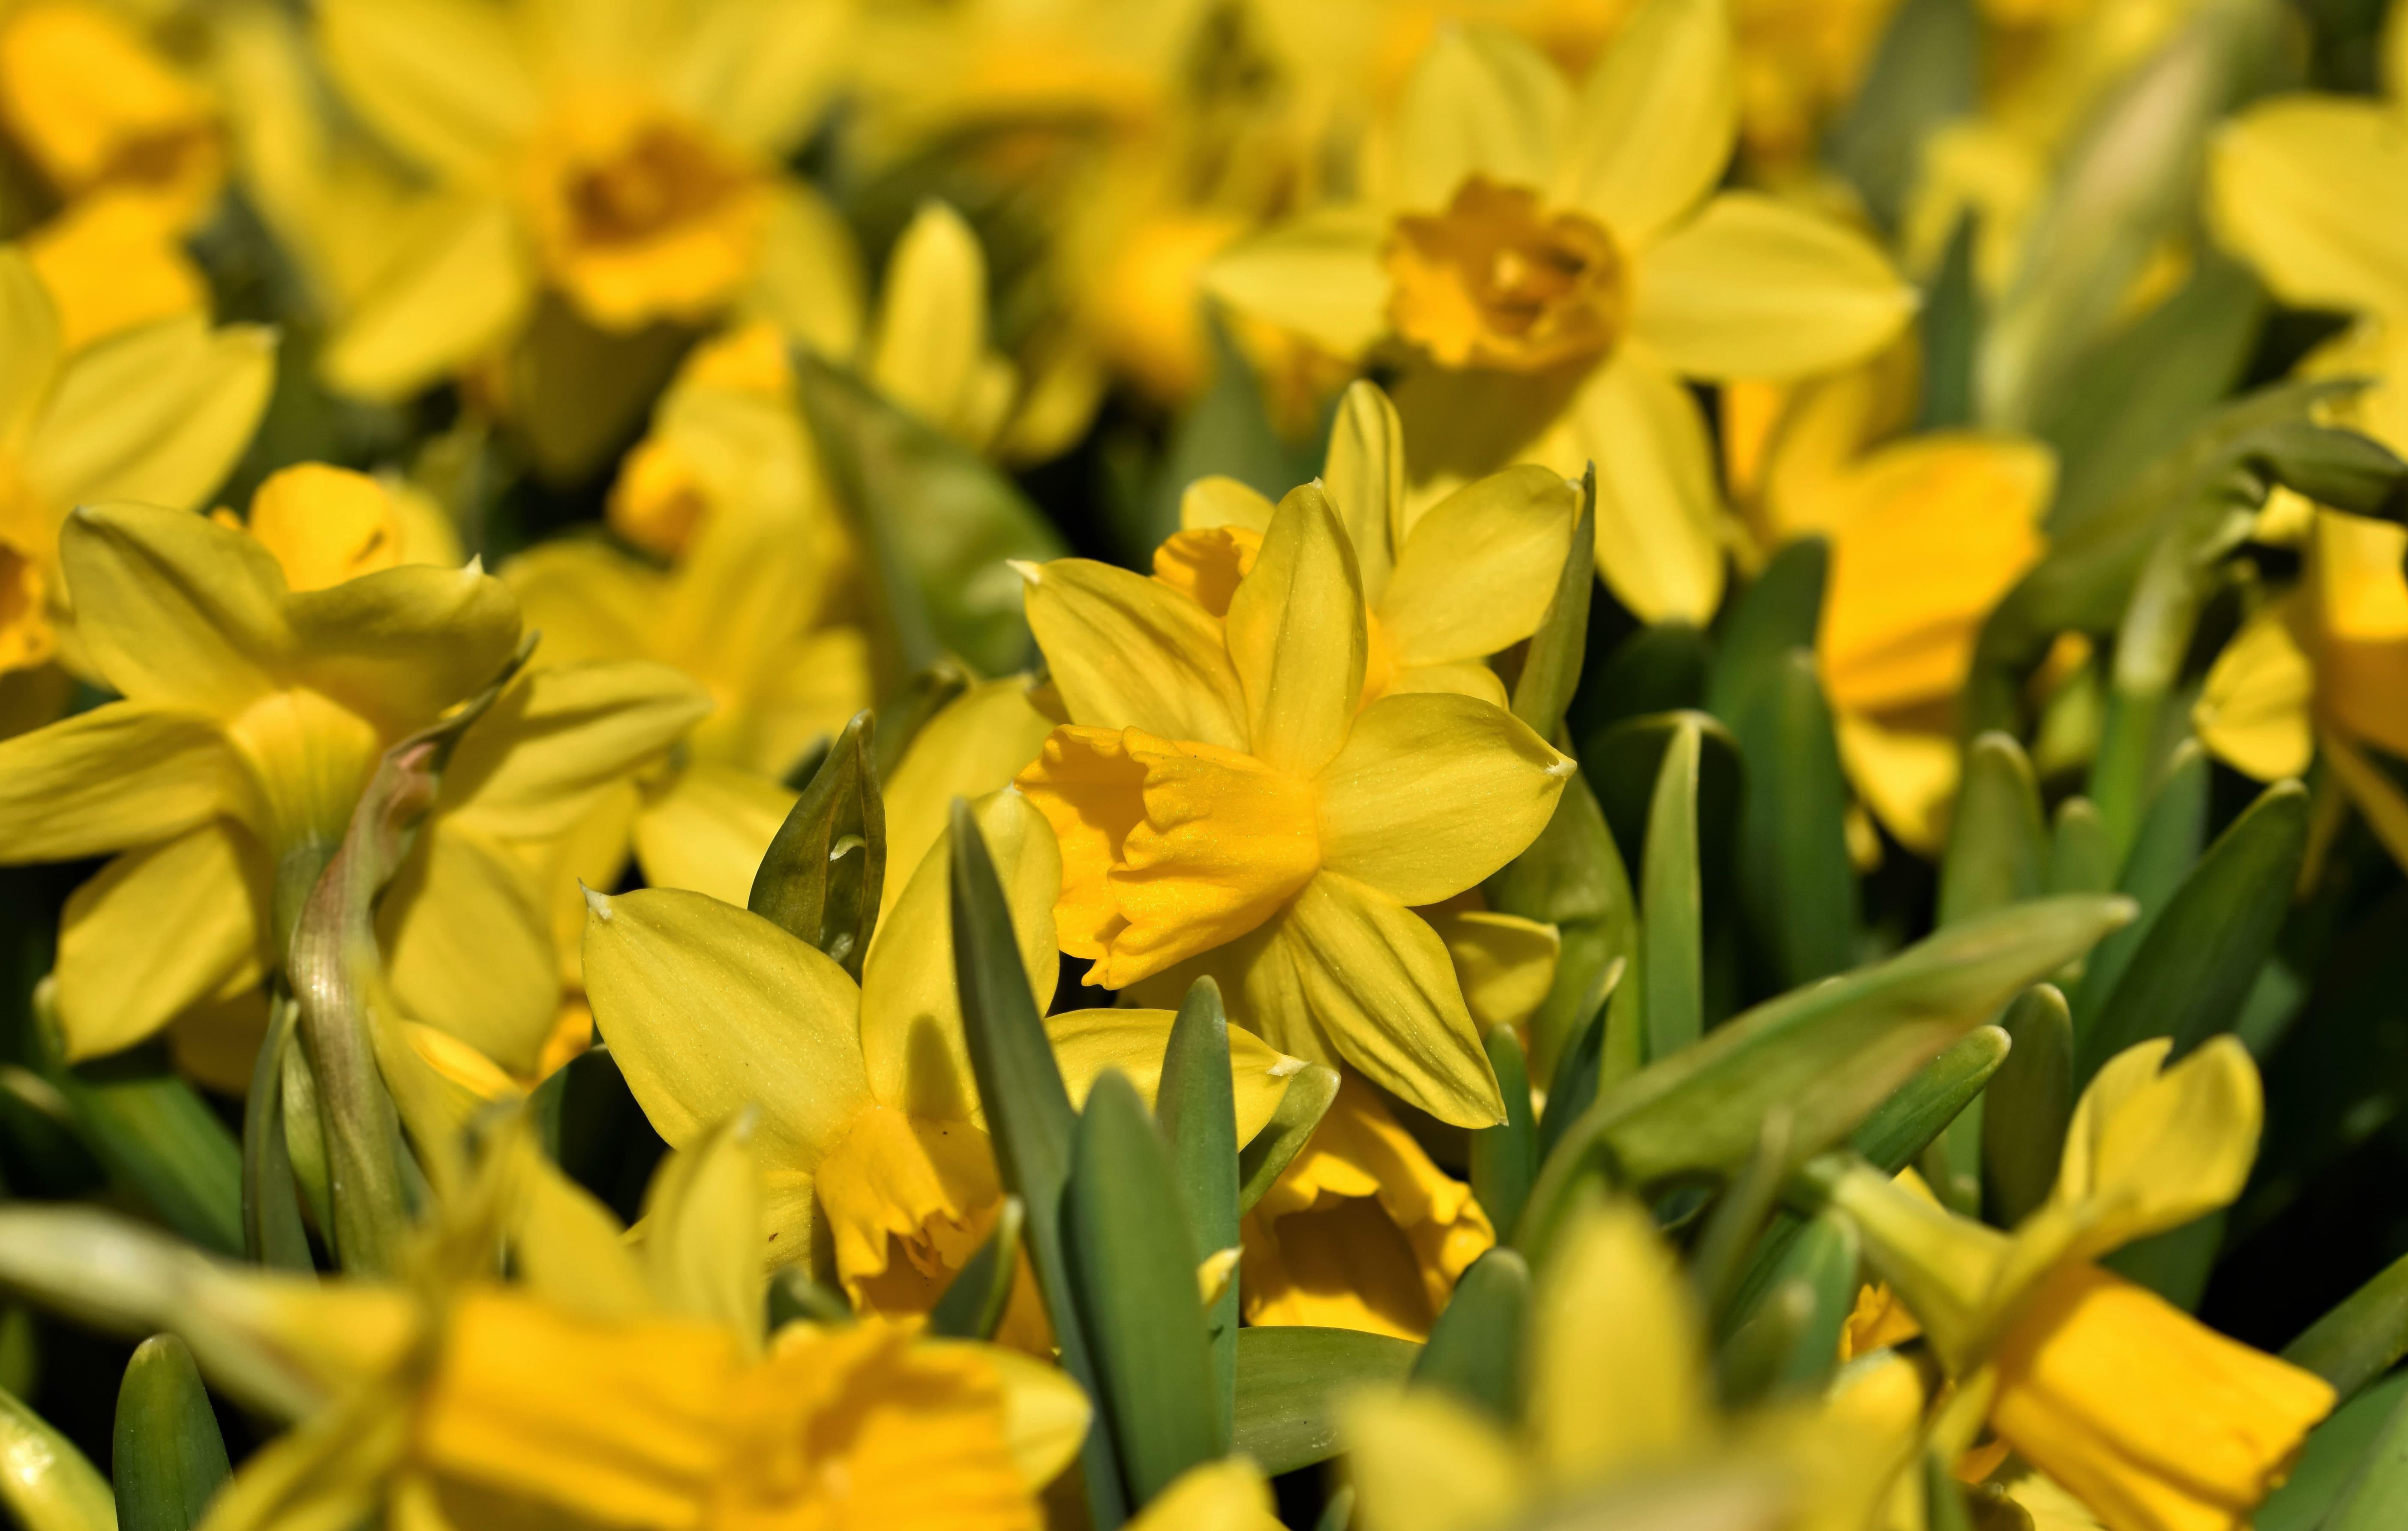 daffodils-photo-64